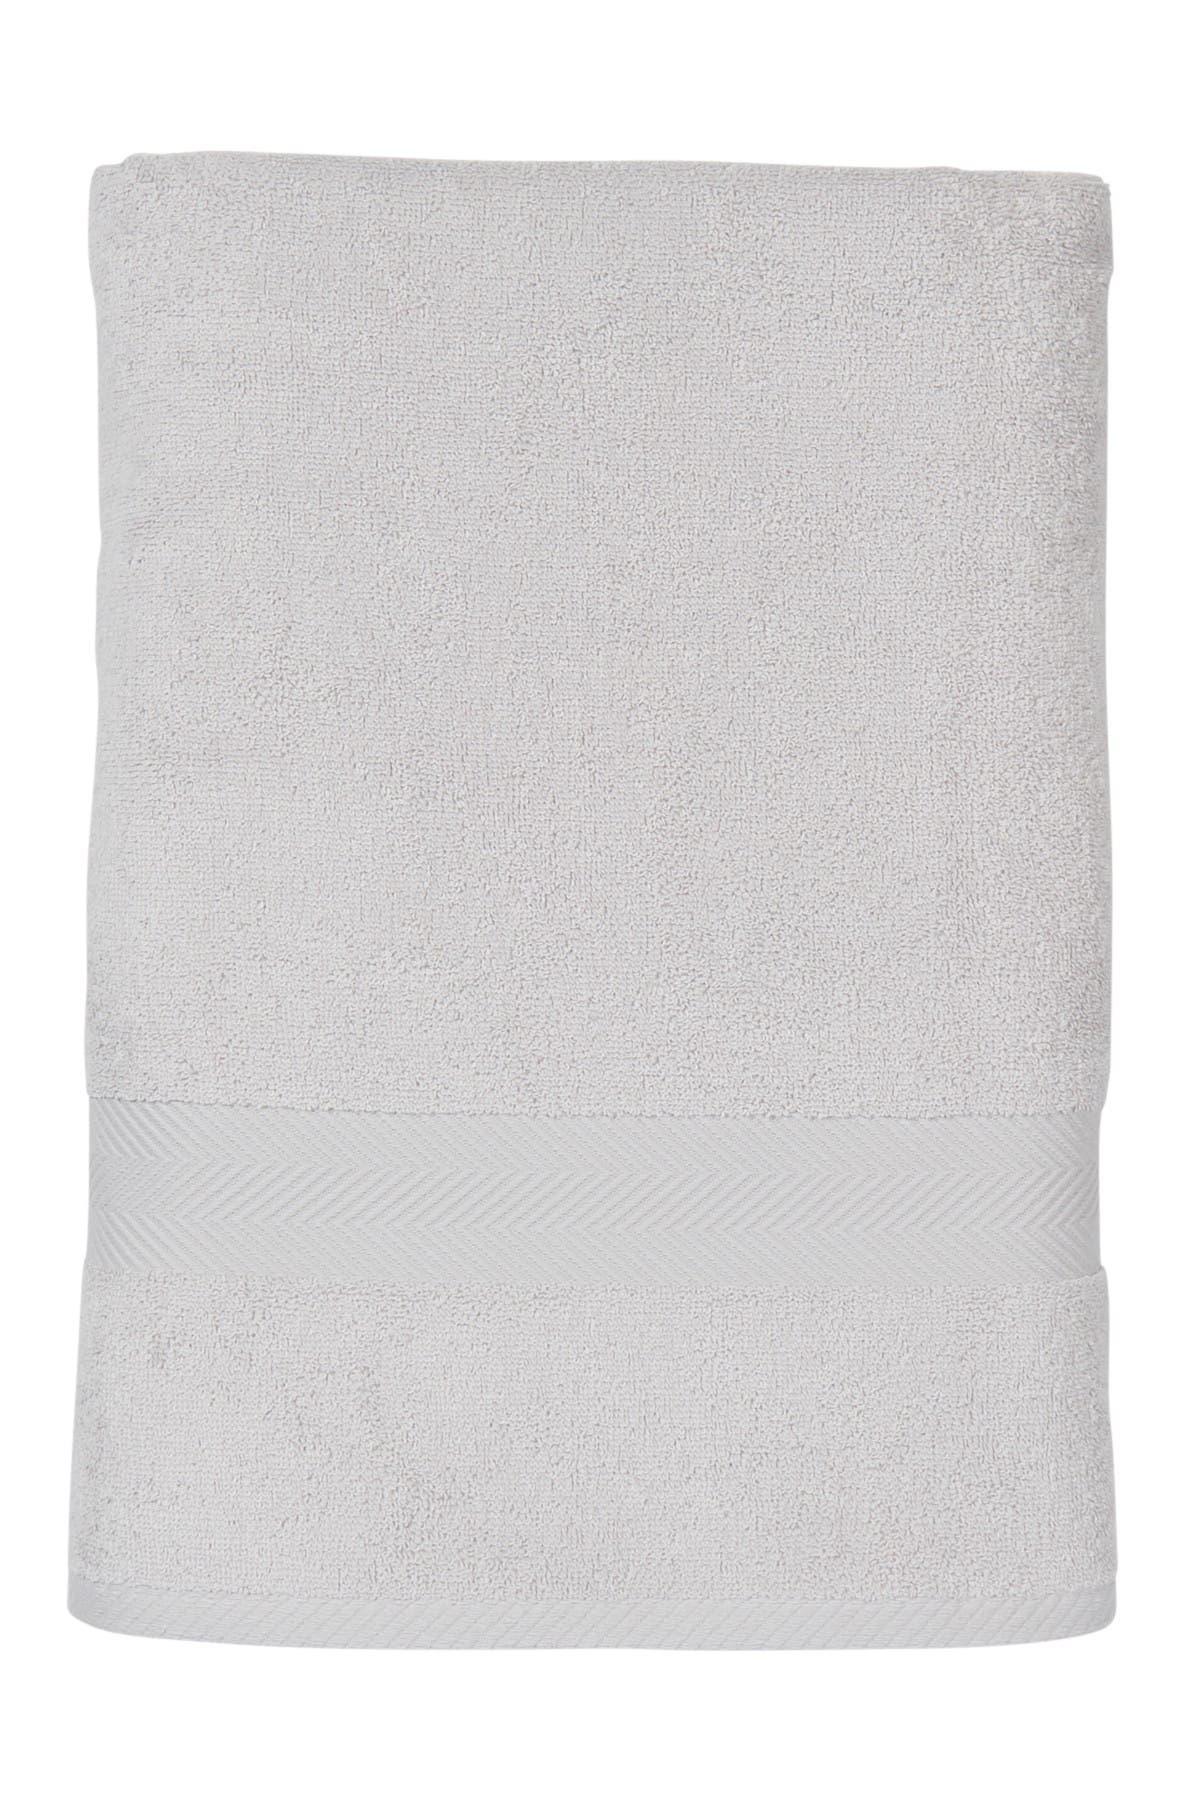 Moda At Home Silver Monarch Turkish Cotton Bath Sheet Nordstrom Rack